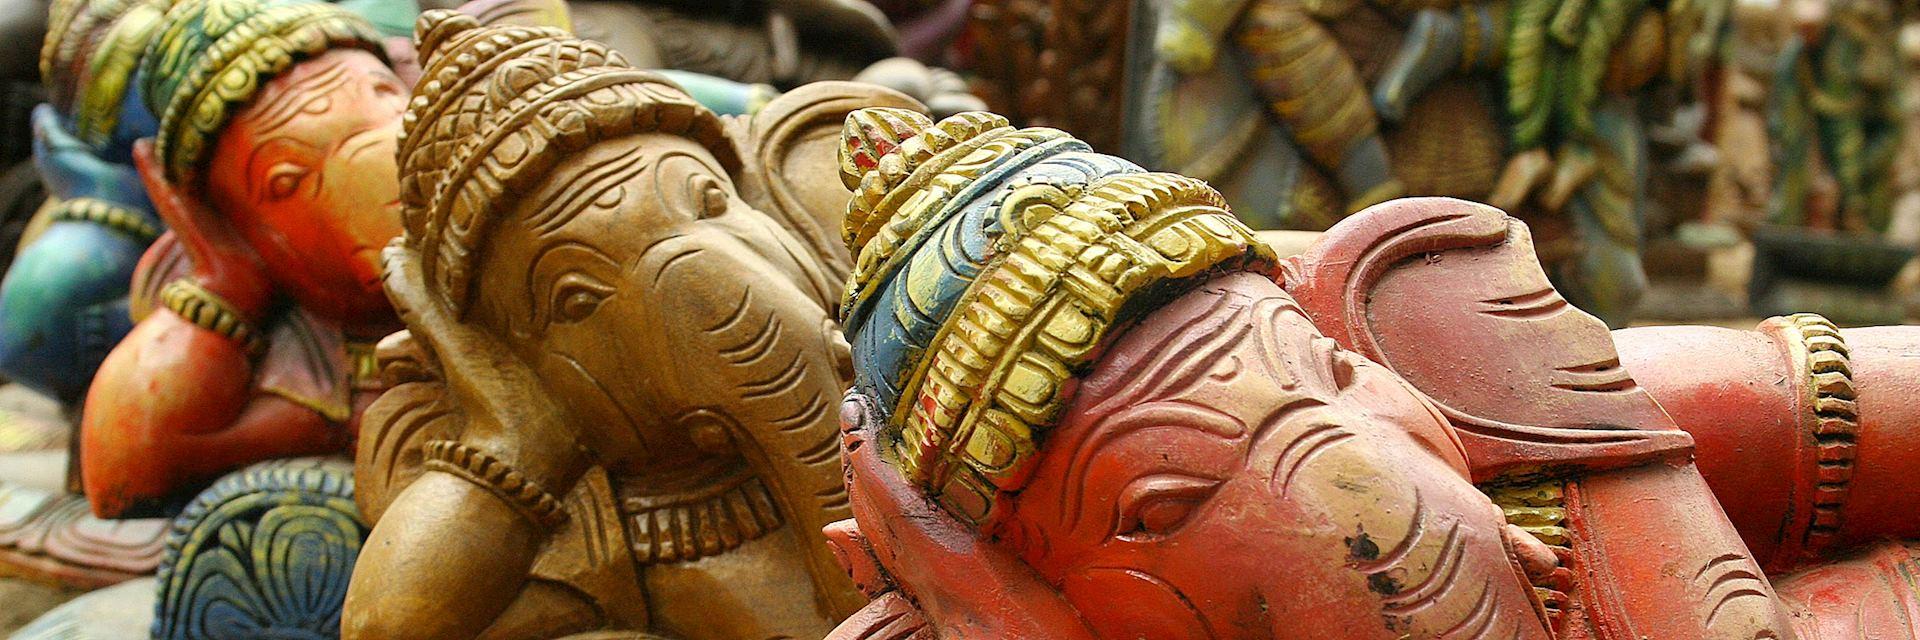 Hindu elephants in Chennai